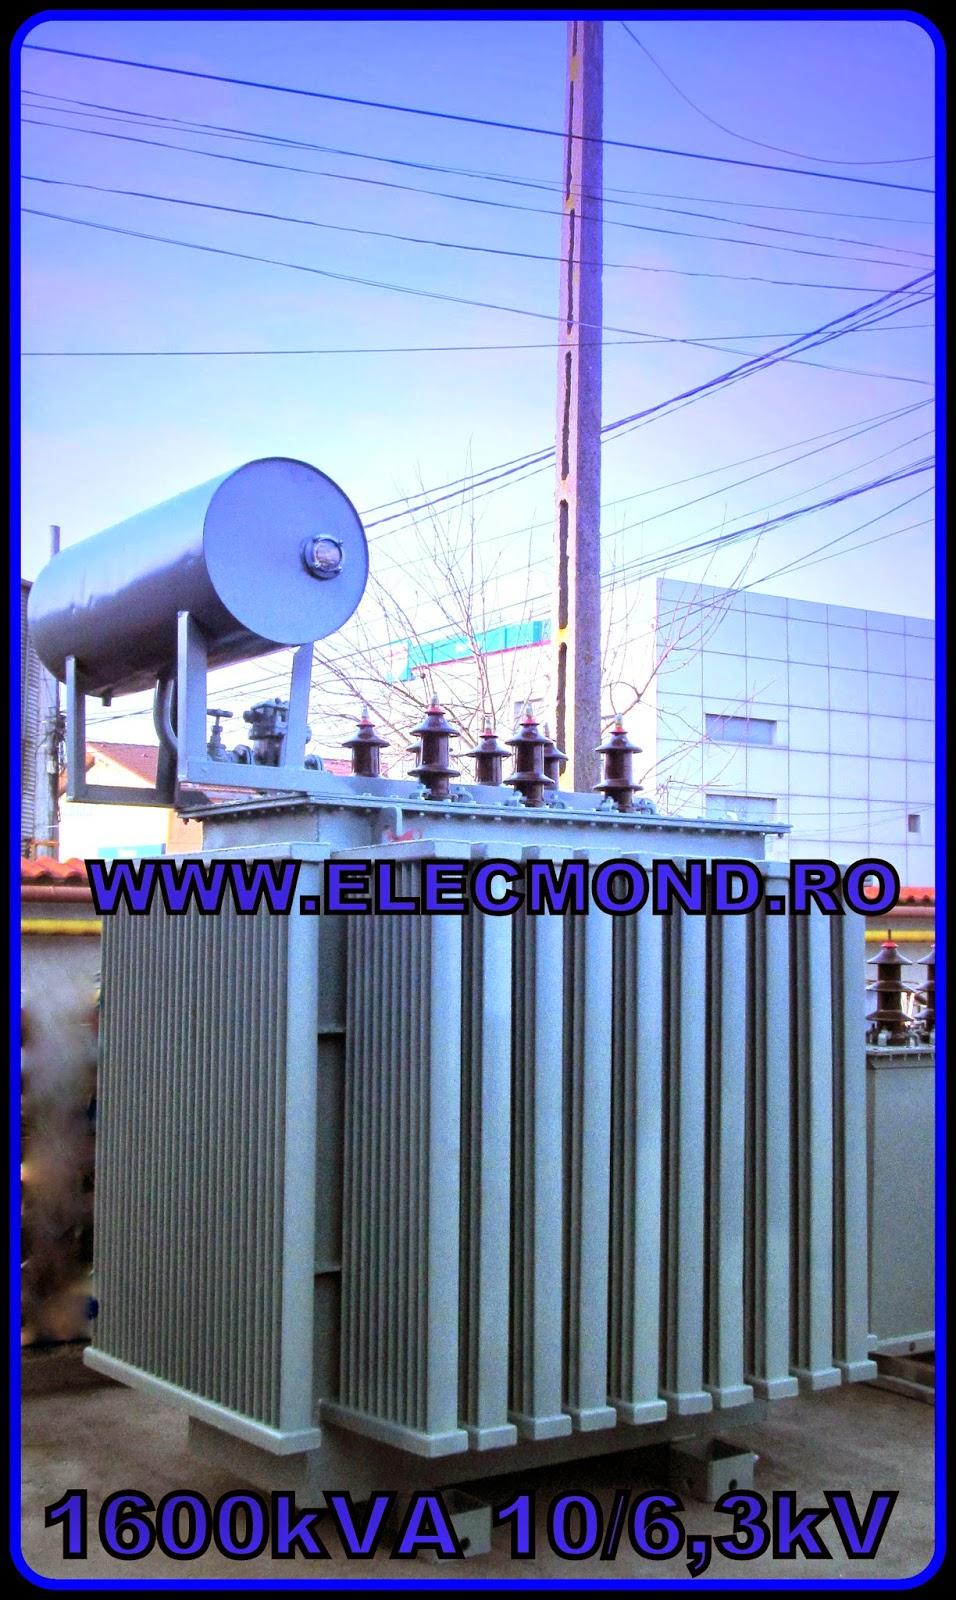 MODIFICARE RAPORT DE TRANSFORMARE , TRANSFORMATOR 1600 kVA 10/6,3 kV , trafo 1600 kVA 10/6,3 kV